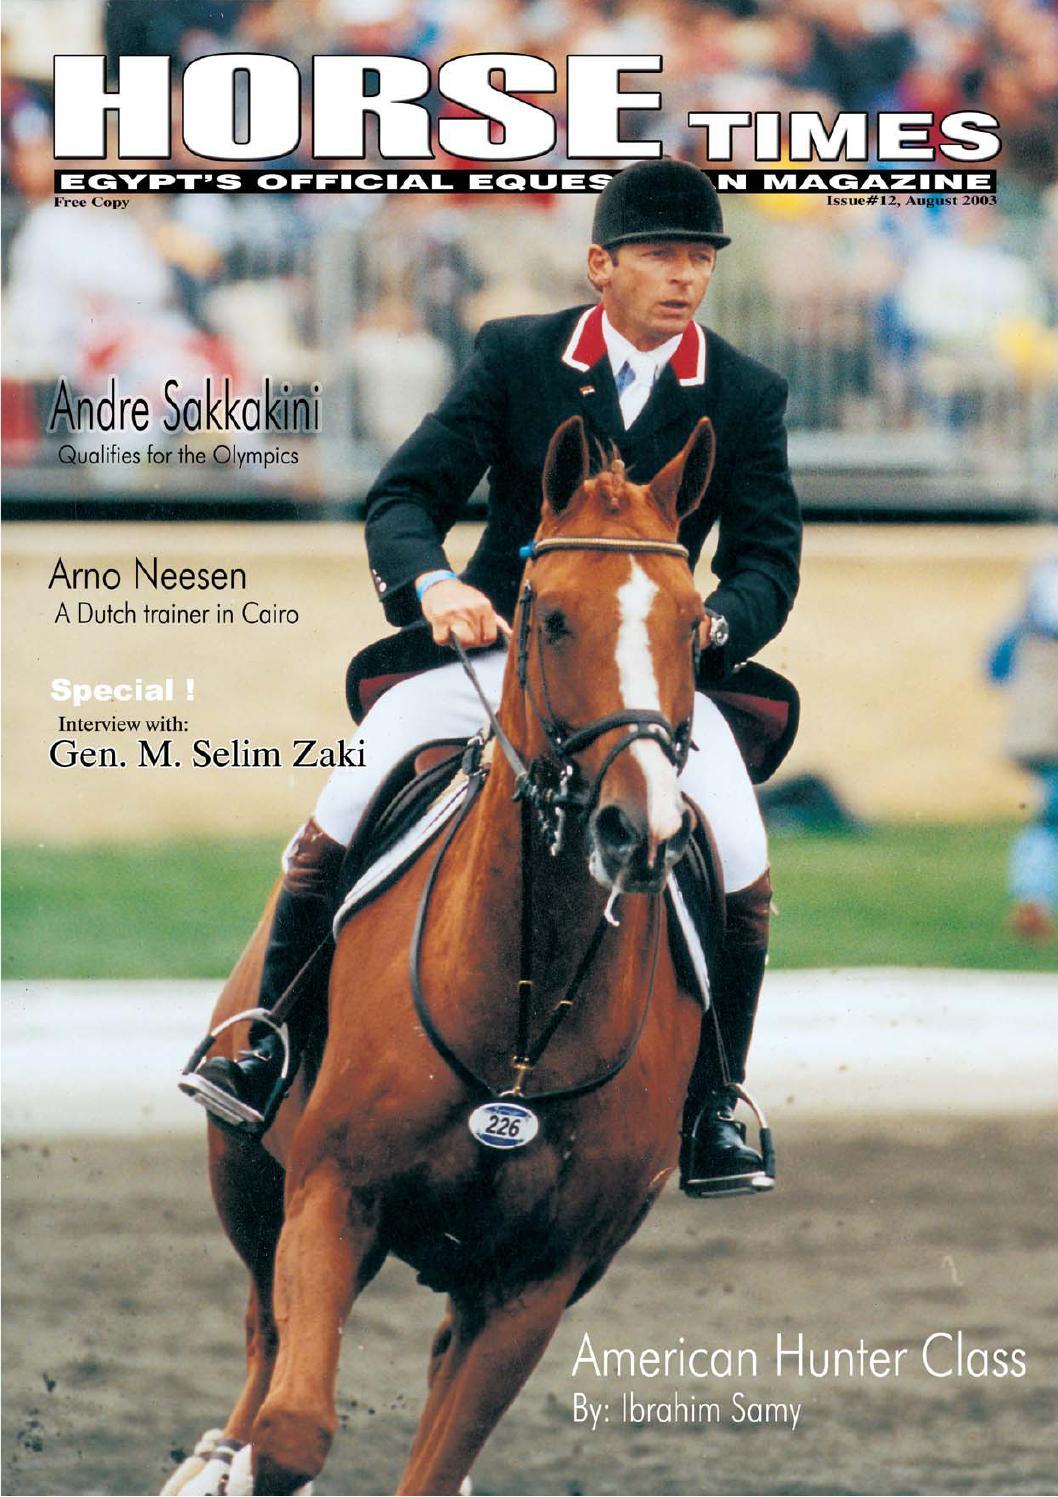 Horse Times 12 By Hrcs Issuu New Voltus Sport Mens Plait